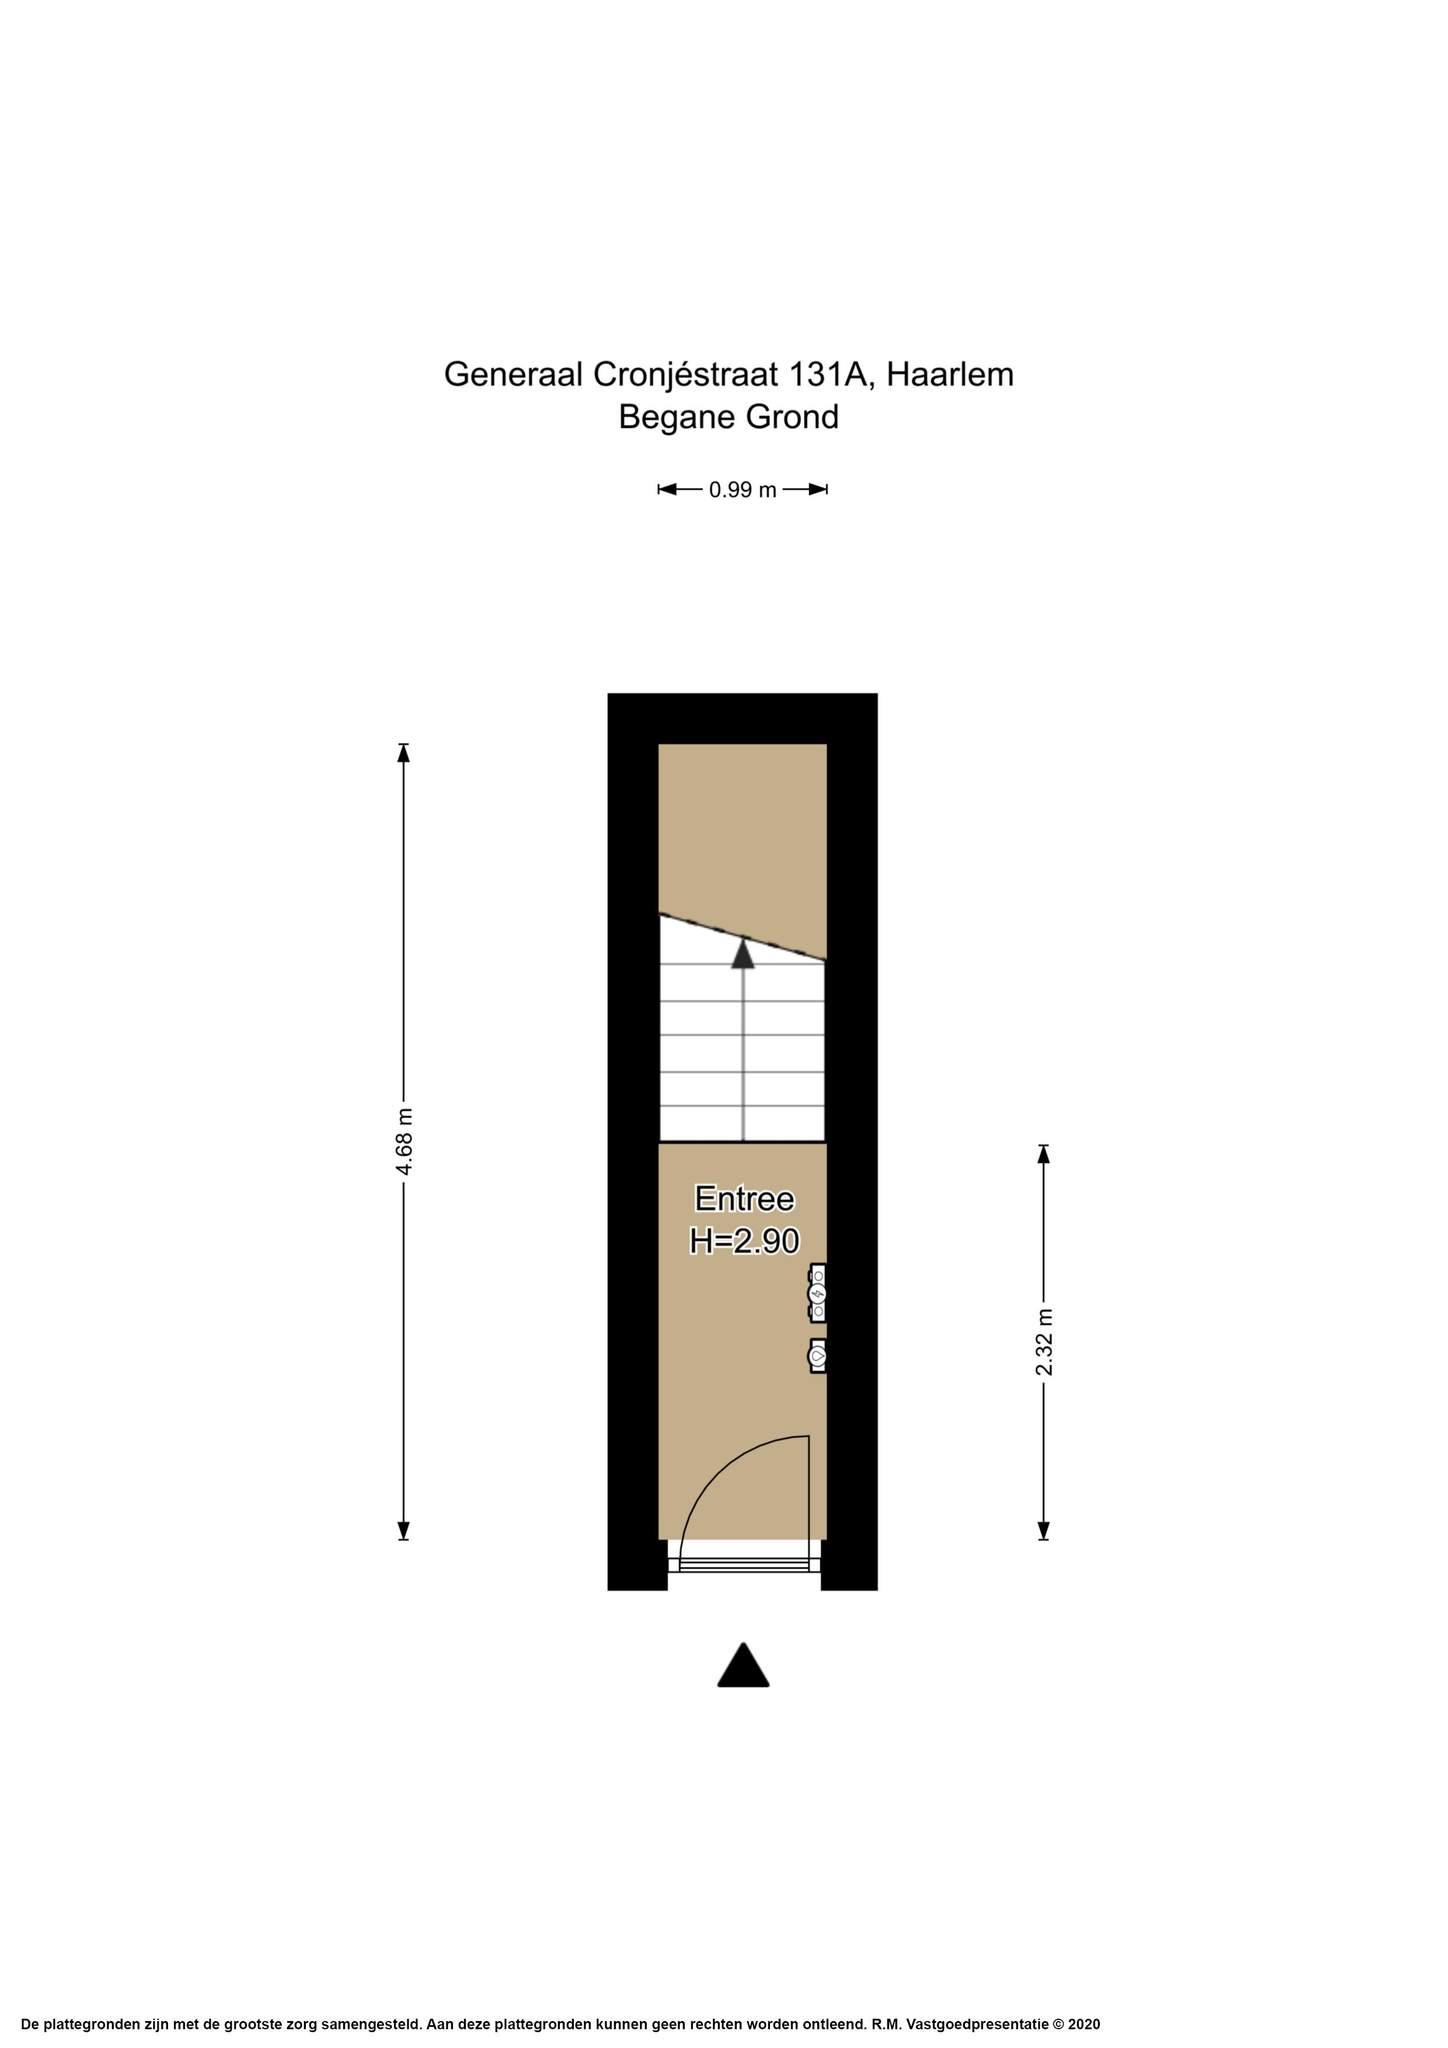 Generaal Cronjestraat 131 A